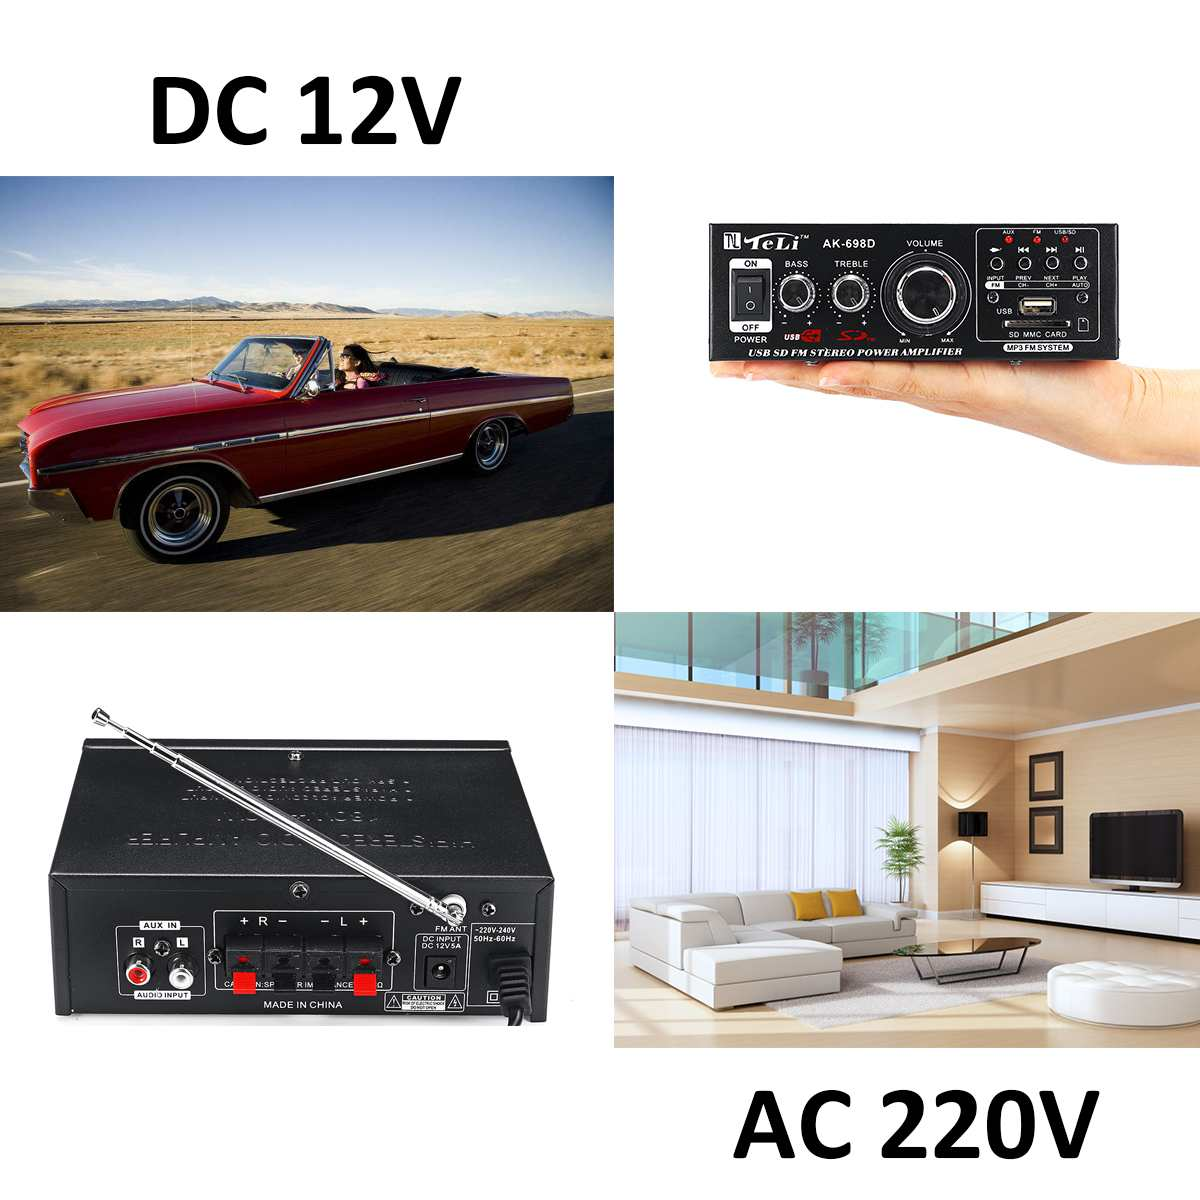 360W 12V/220V HIFI Audio Stereo Power Amplifier FM Radio 2CH Car Home Amplificador Audio with Remote Control